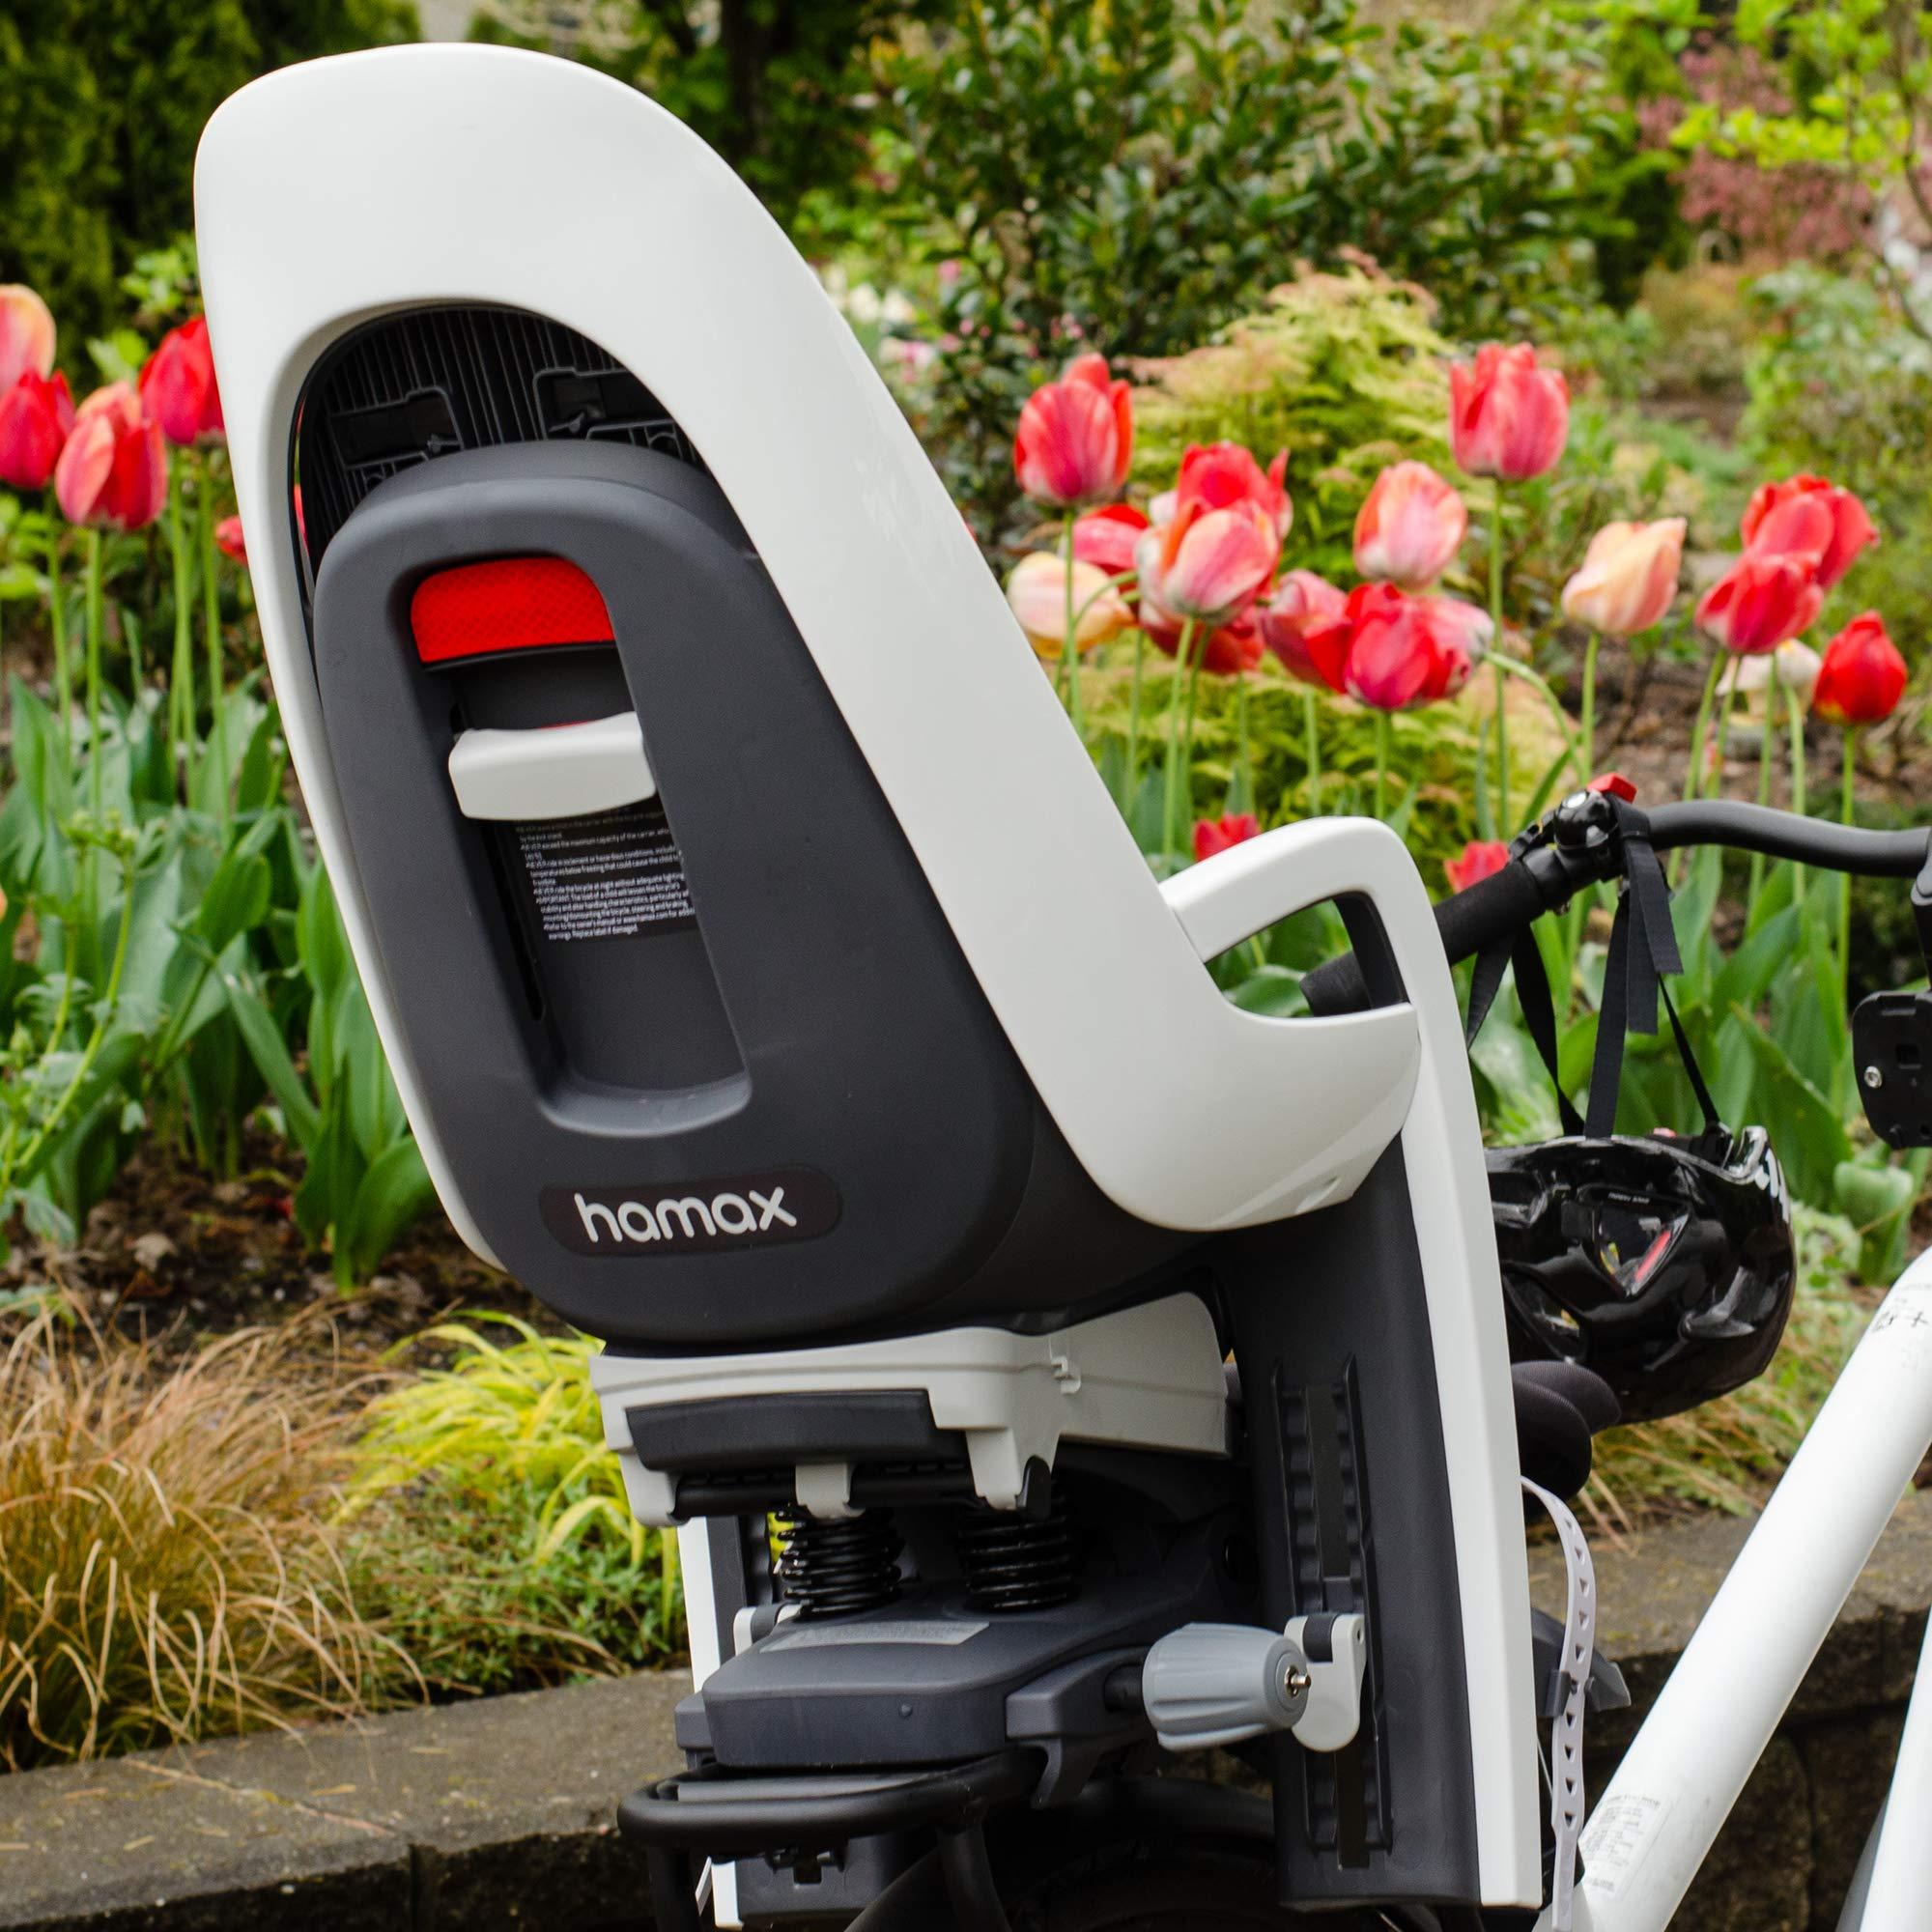 553062 Hamax Zenith Relax Fahrrad Kindersitz Gep/äcktr/äger Schwarz Rot City Trekking E-Bike 9 Monate 22 kg